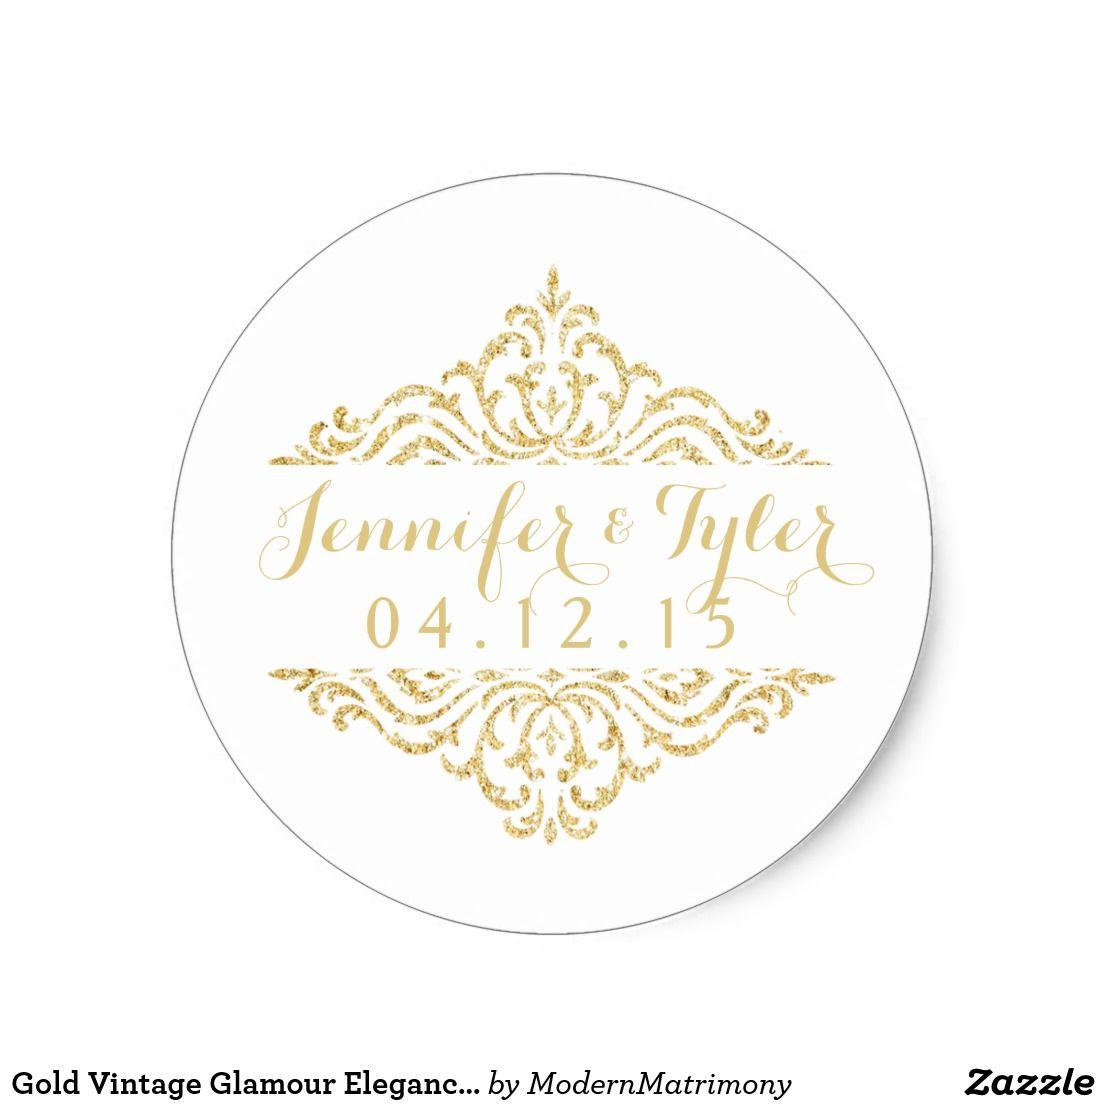 Gold Vintage Glamour Elegance Wedding Stickers This elegant, vintage ...